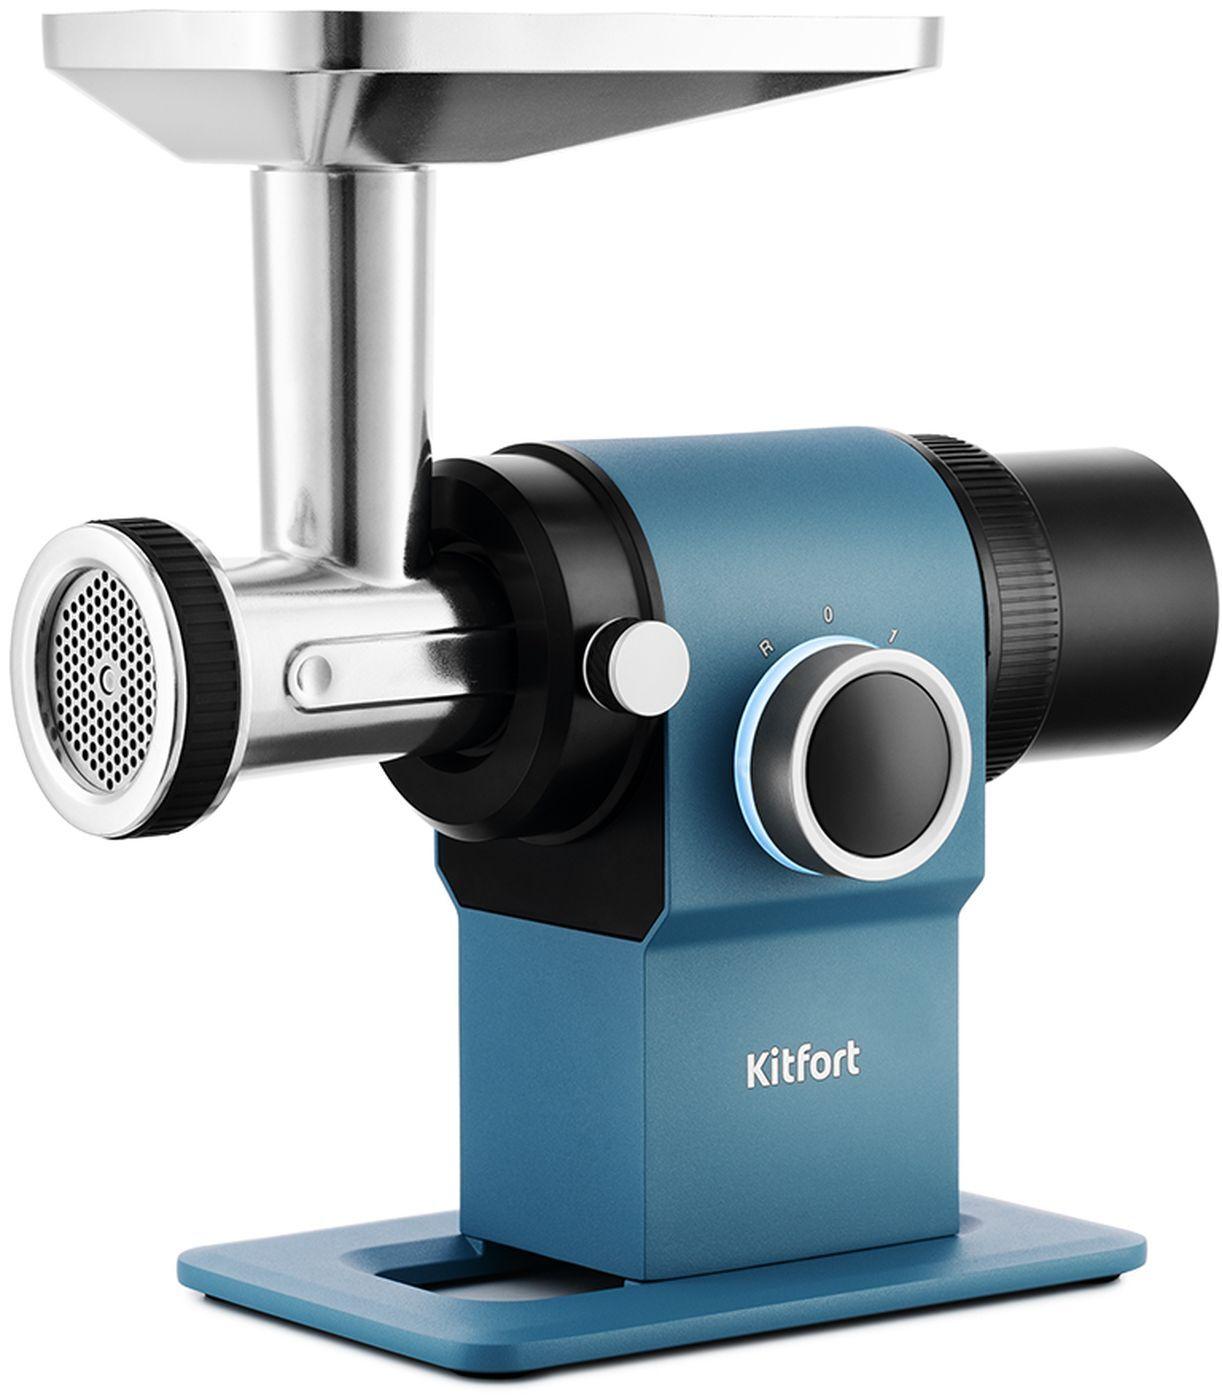 Мясорубка Kitfort КТ-2110, голубой